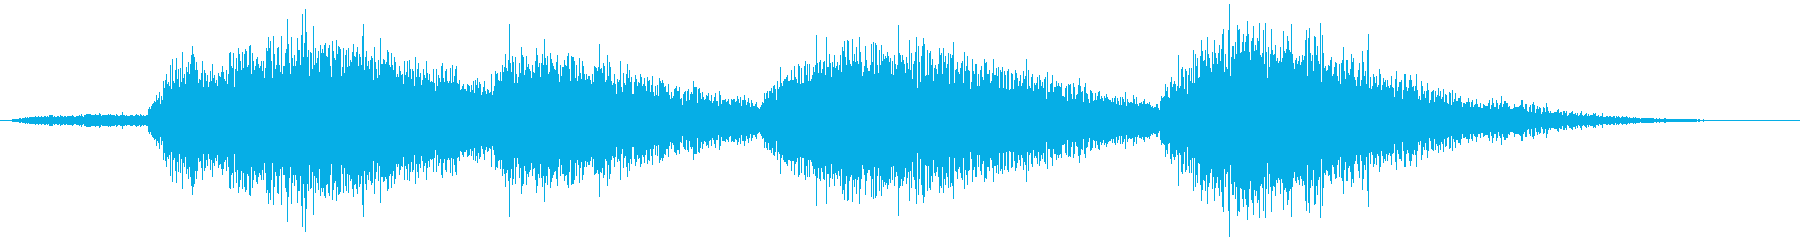 GHOSTS 4 SCREAMIN...の再生済みの波形